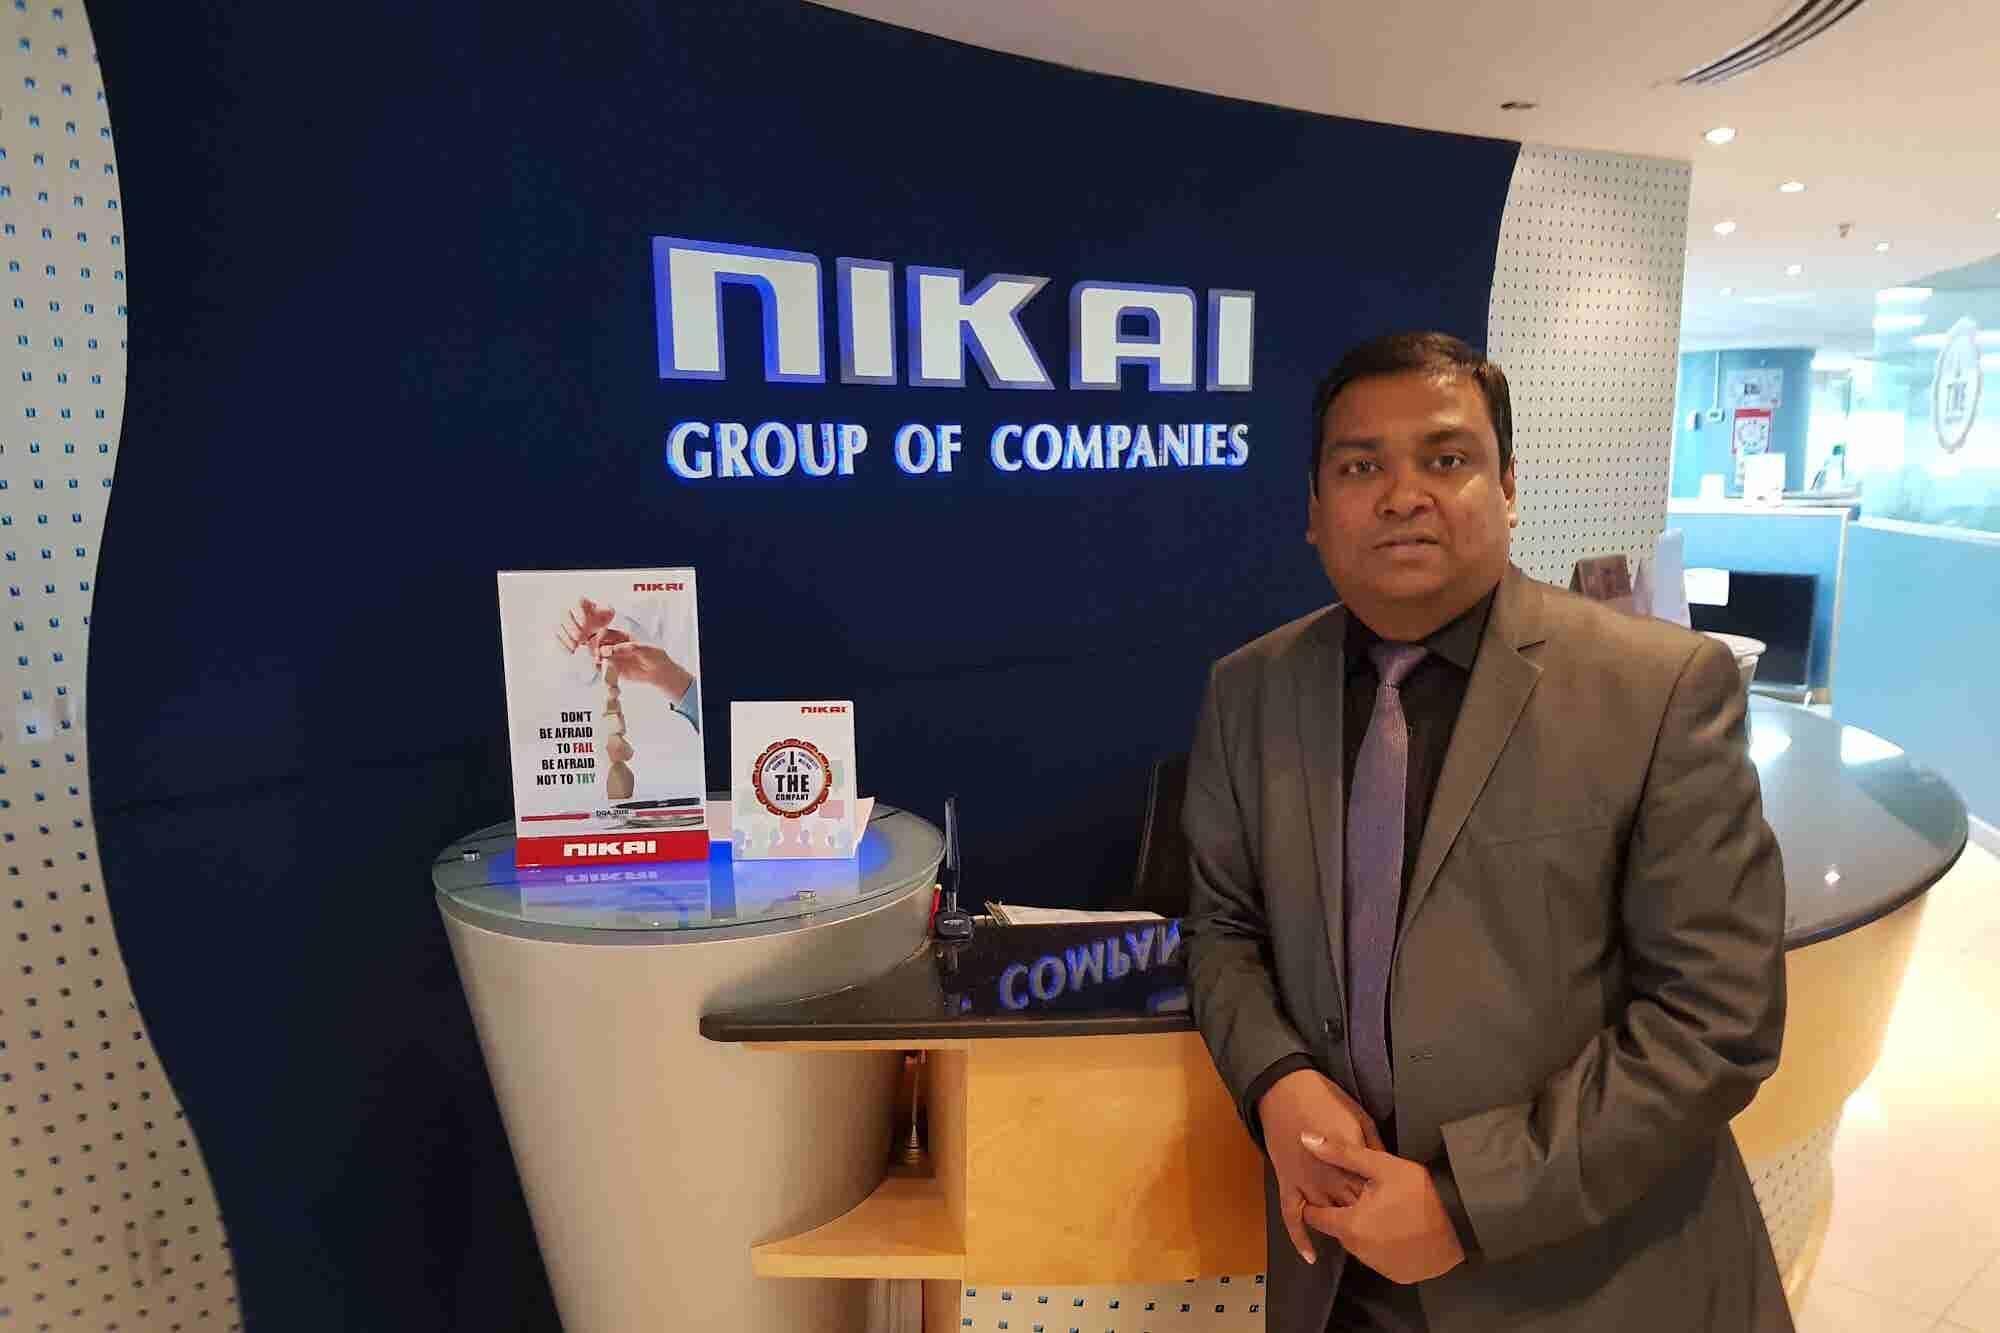 Once A Dubai Startup, NIKAI Group Now Supports Entrepreneurs With Dubai Startup Hub's Market Access Program